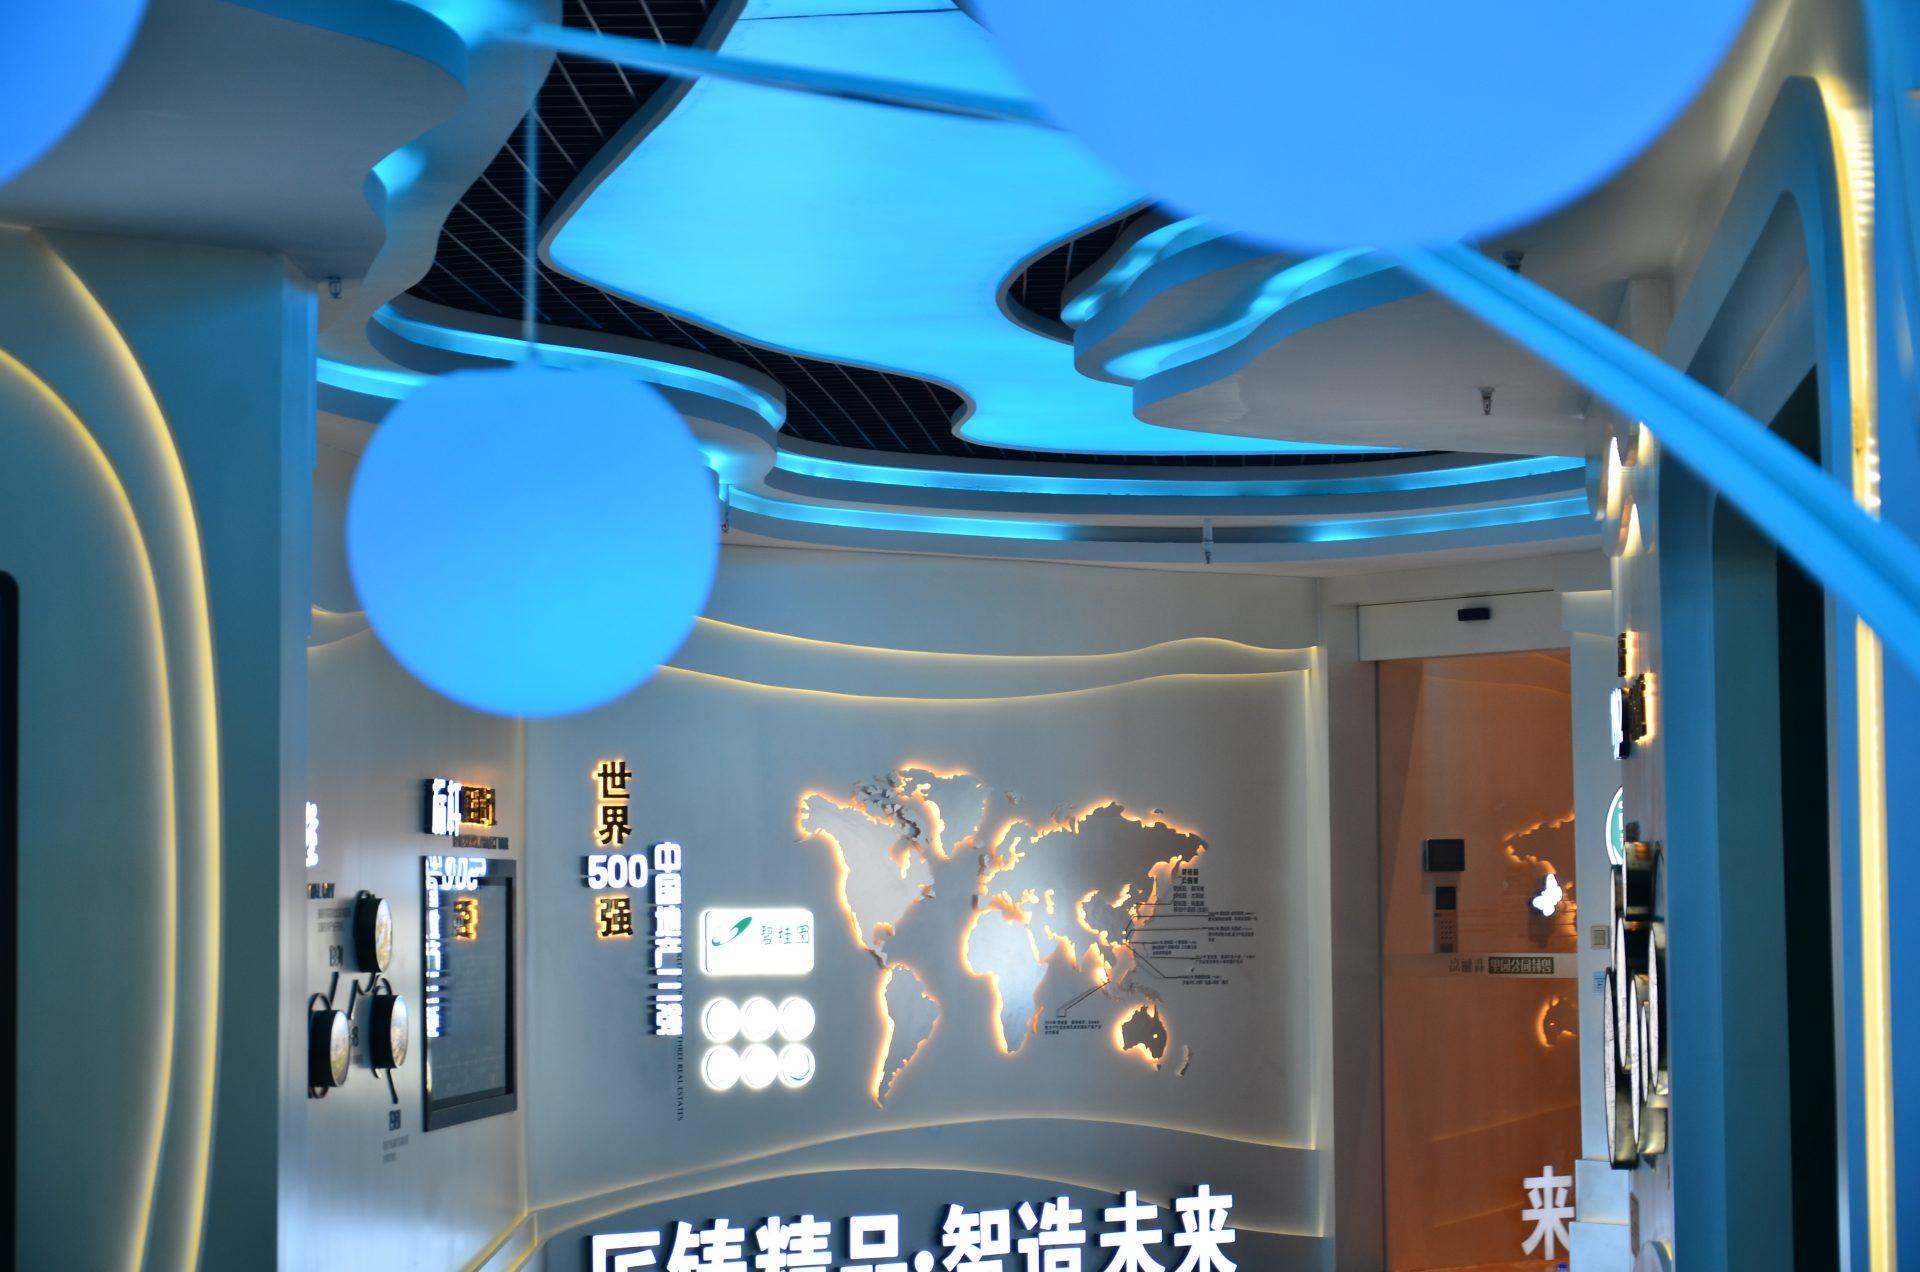 BlueDotCC:沈阳碧桂园公园里建造东北首个4.0体验展示馆